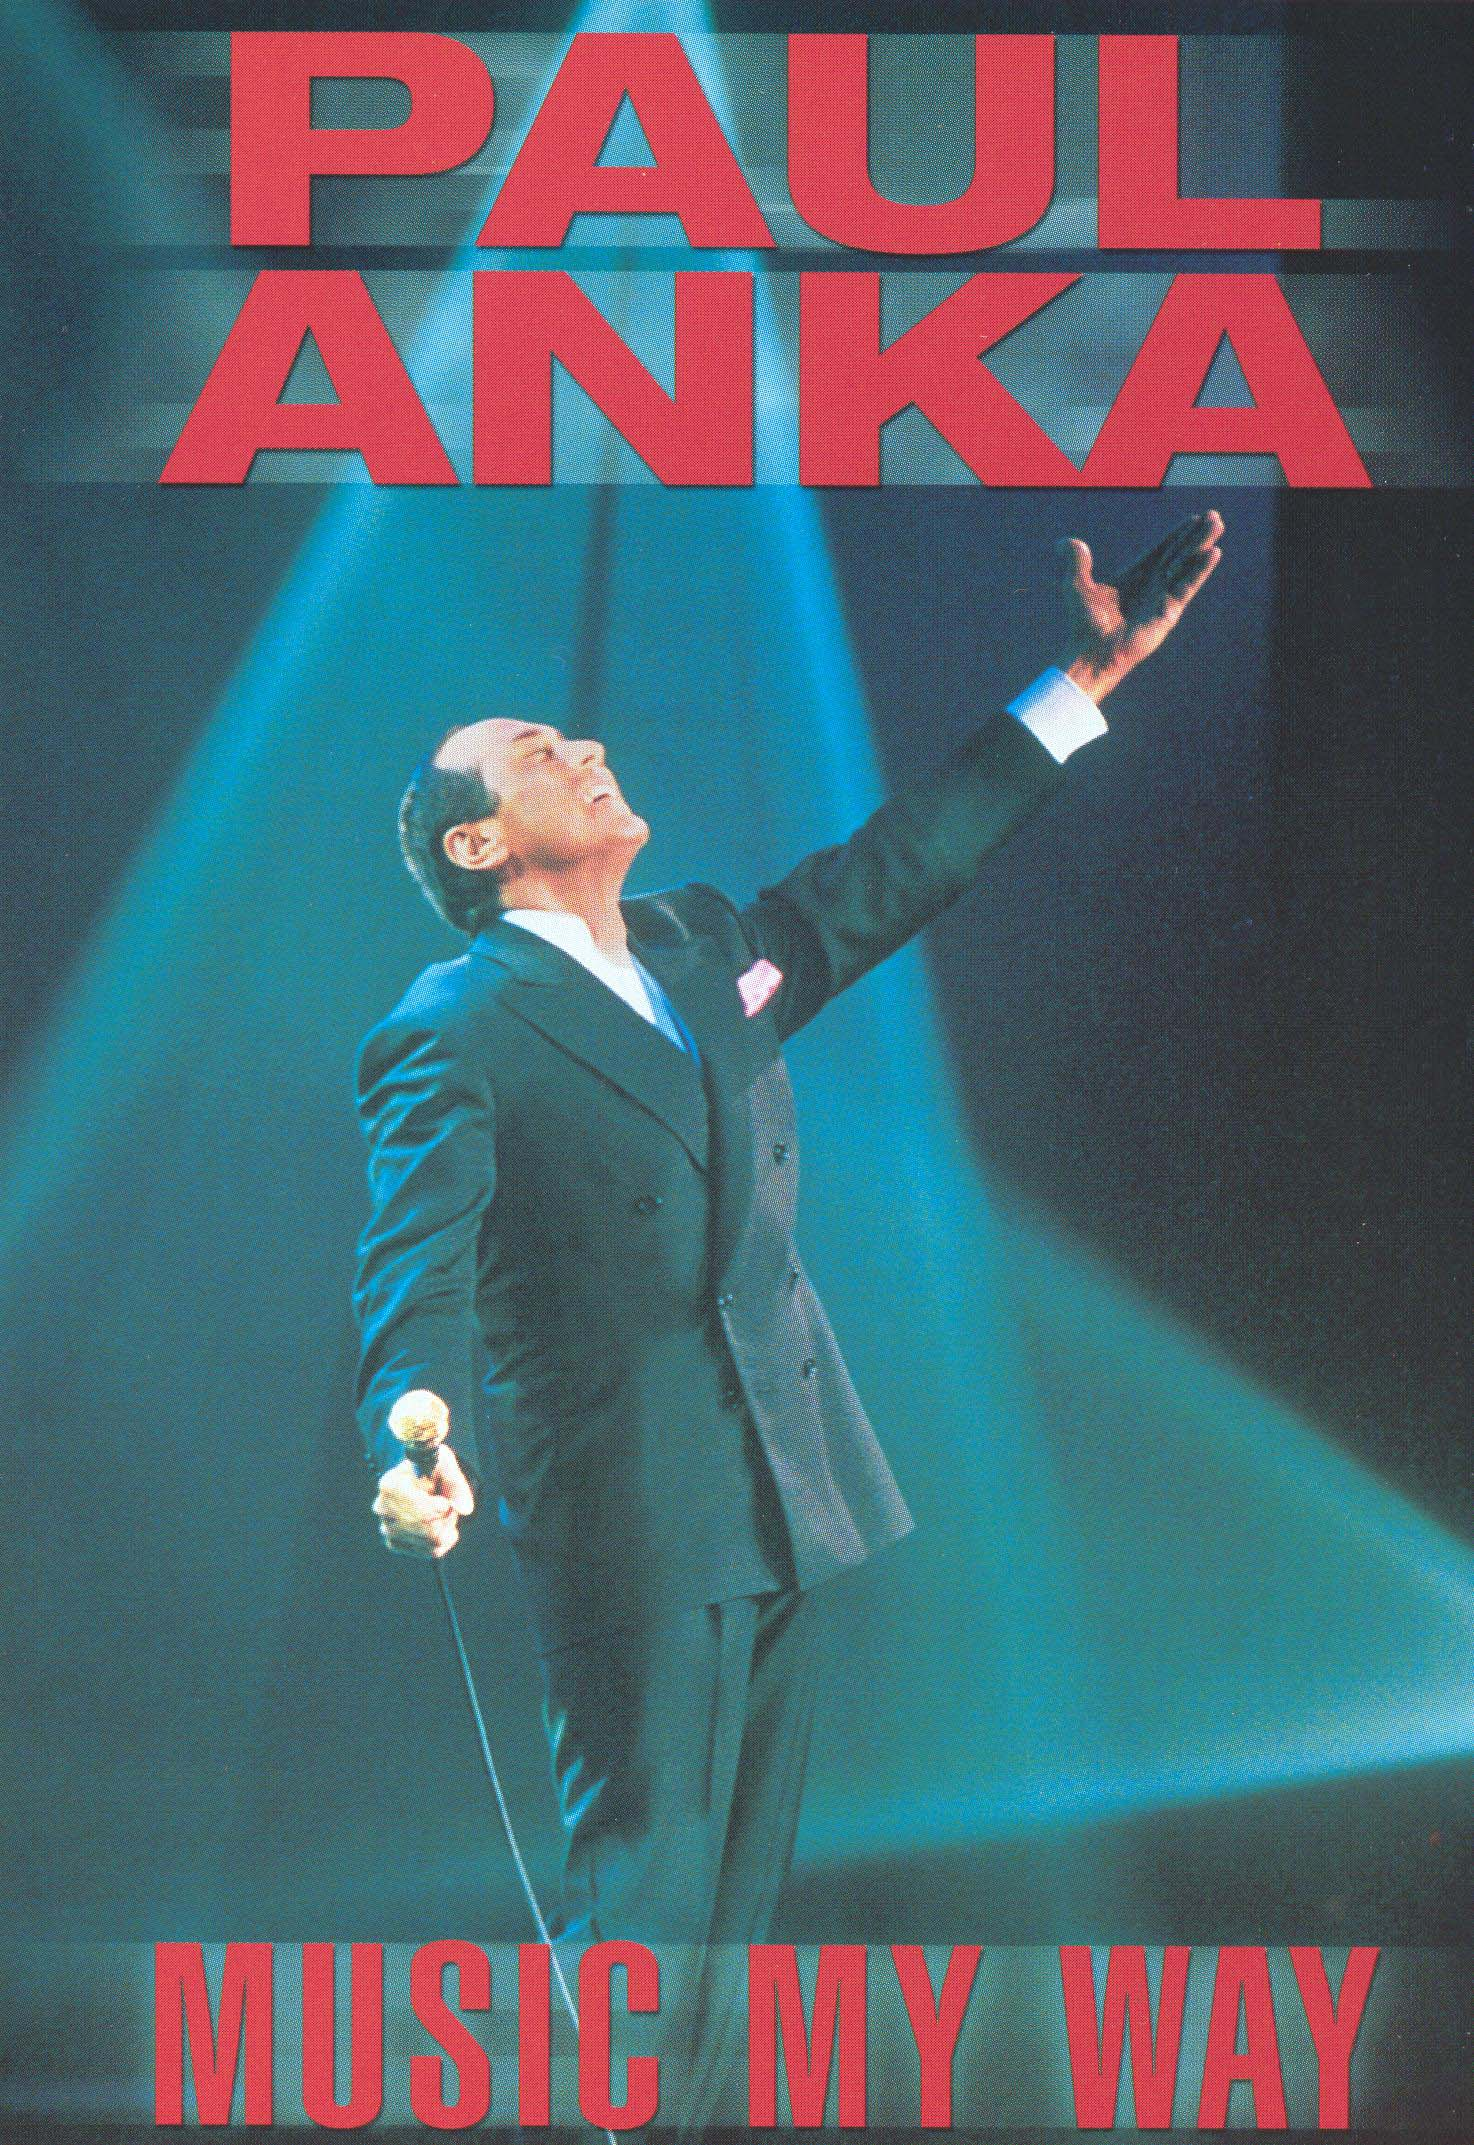 Paul Anka: Music My Way